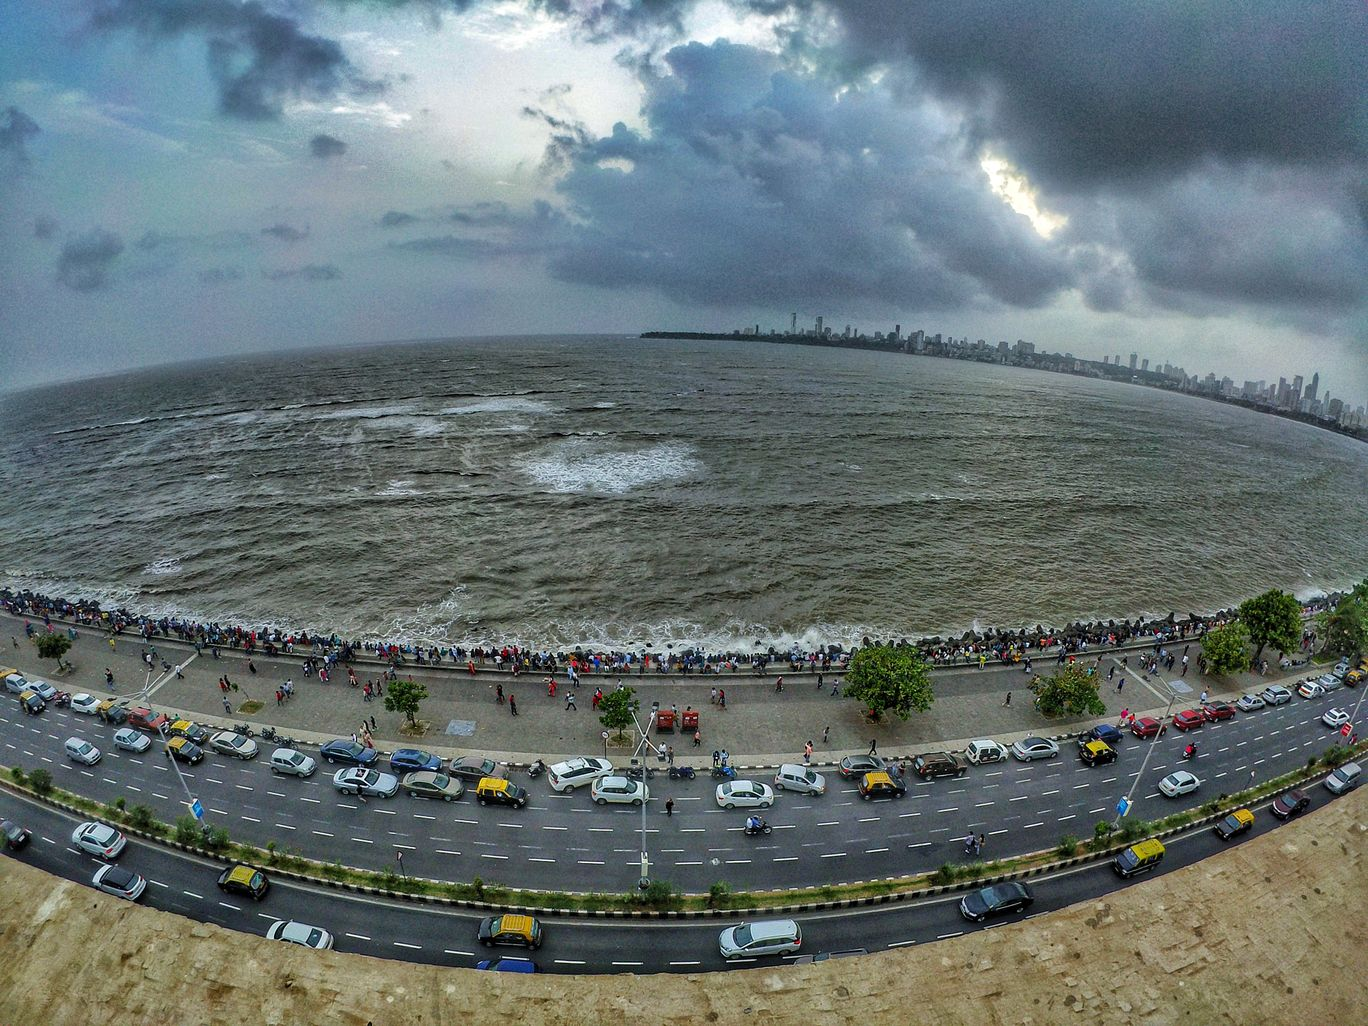 Photo of New Delhi By Manish Dev Singh